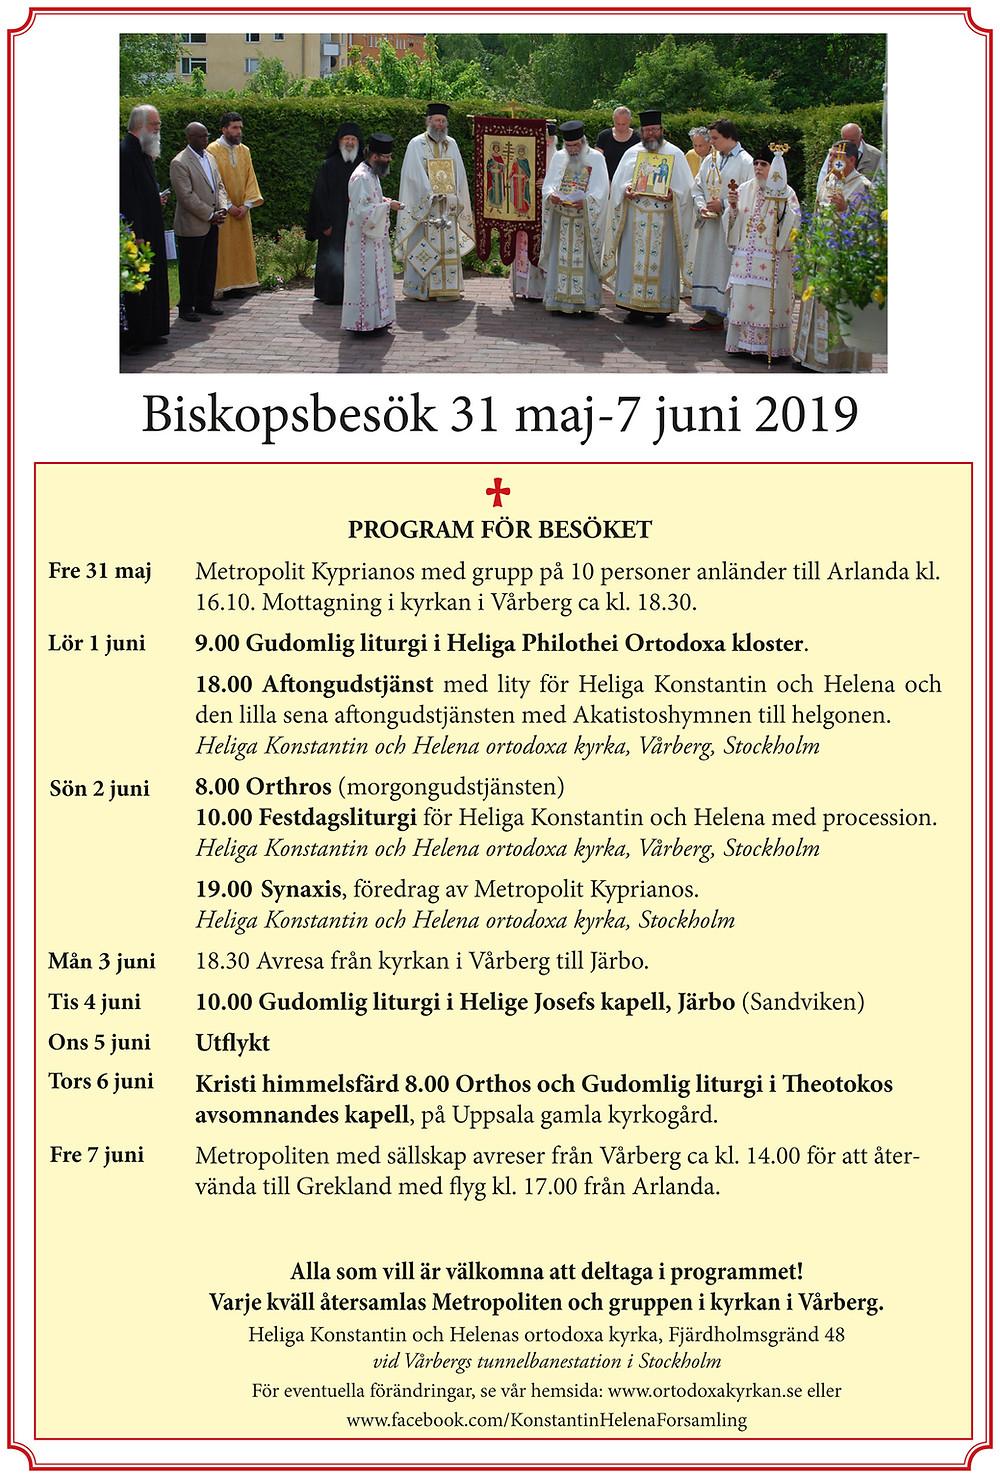 Biskopsbesök 31 maj-7 juni 2019